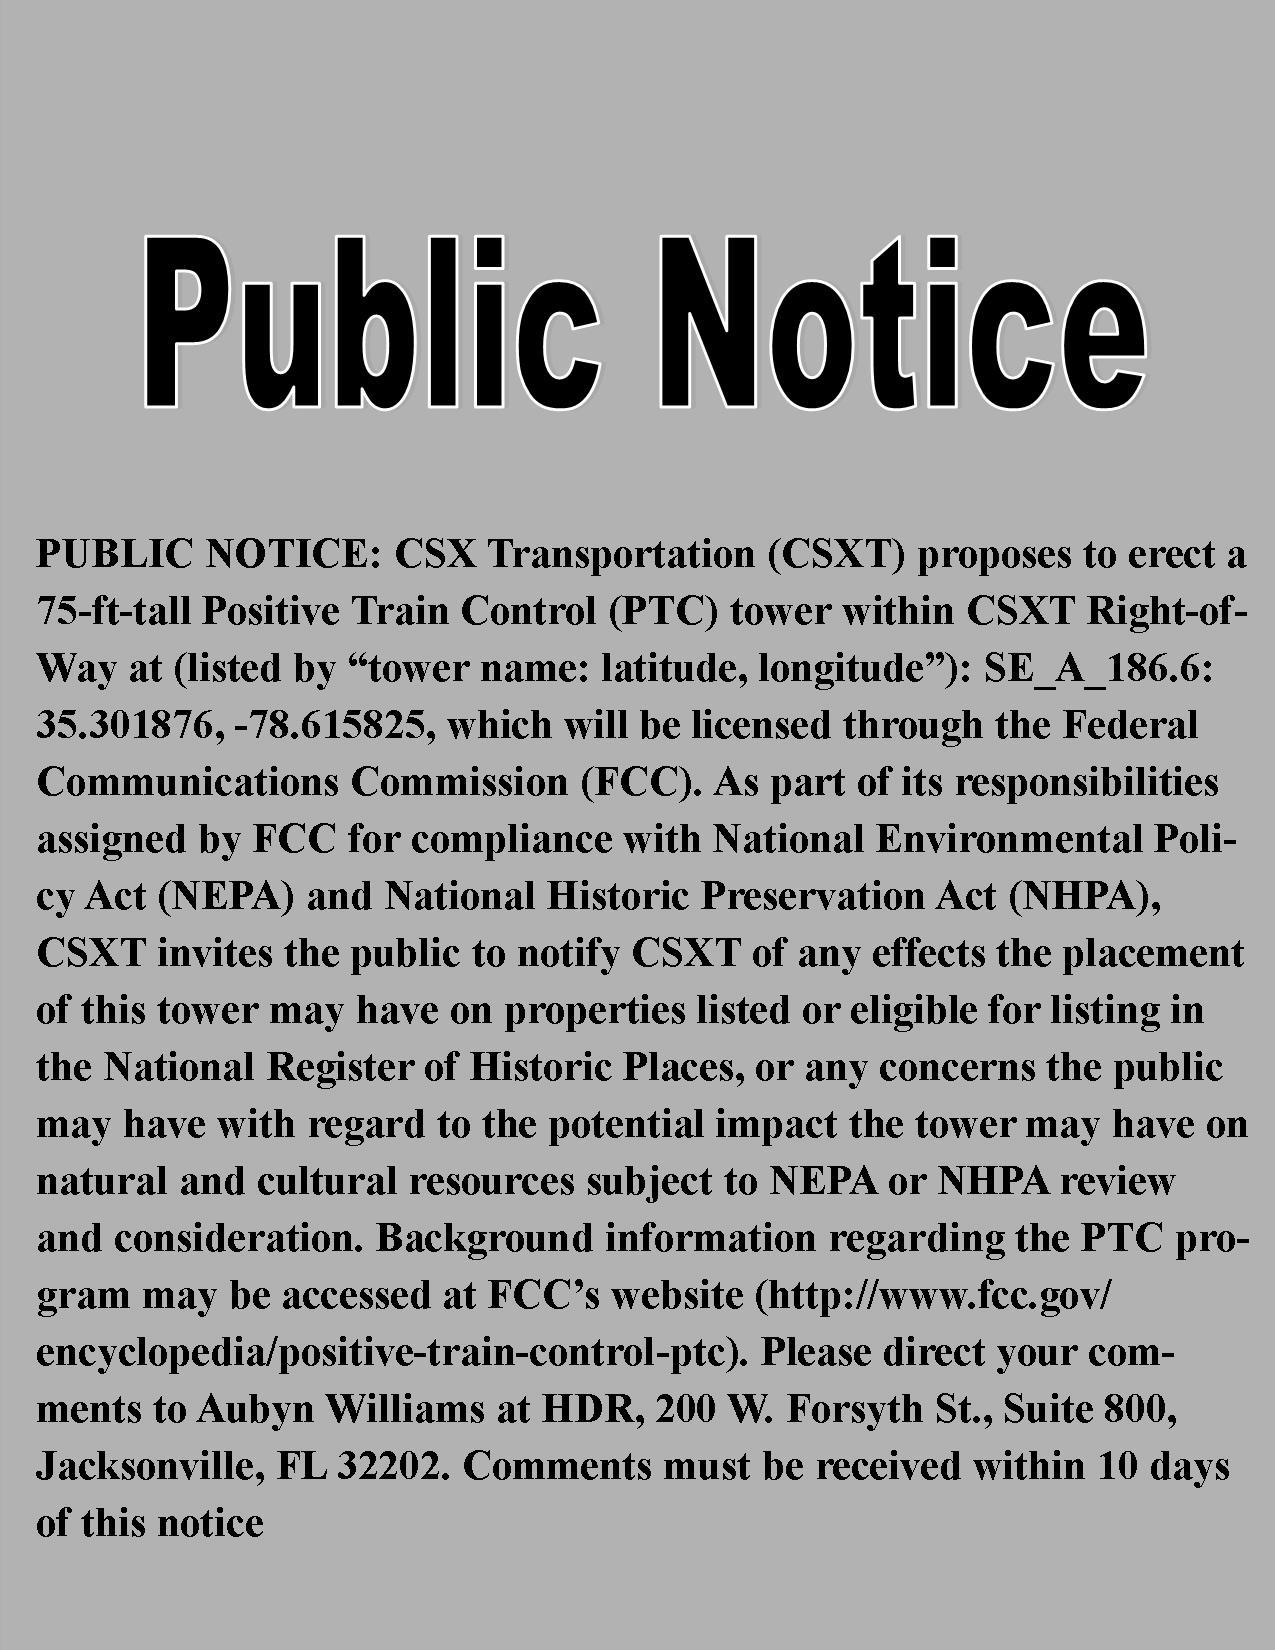 Publicnotice